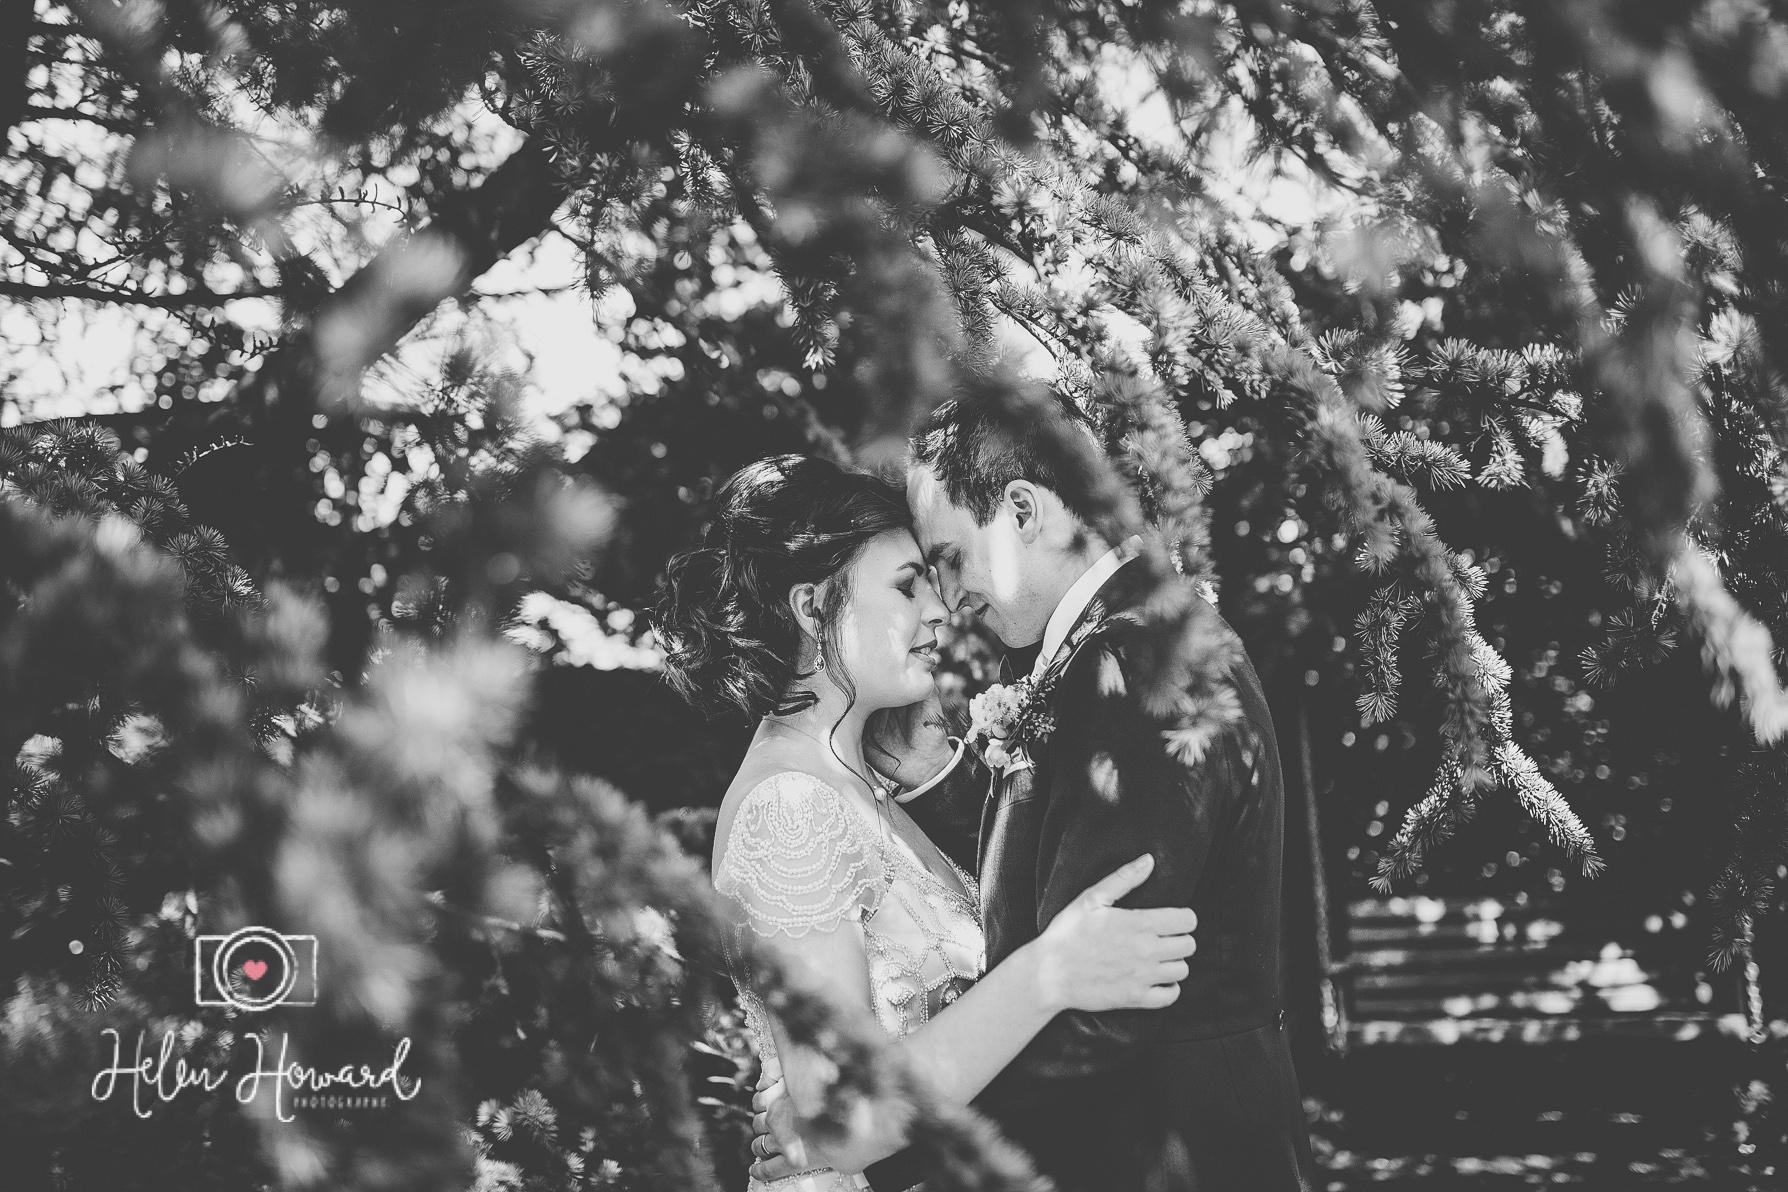 Helen Howard Photography Packington Moor Wedding-84.jpg